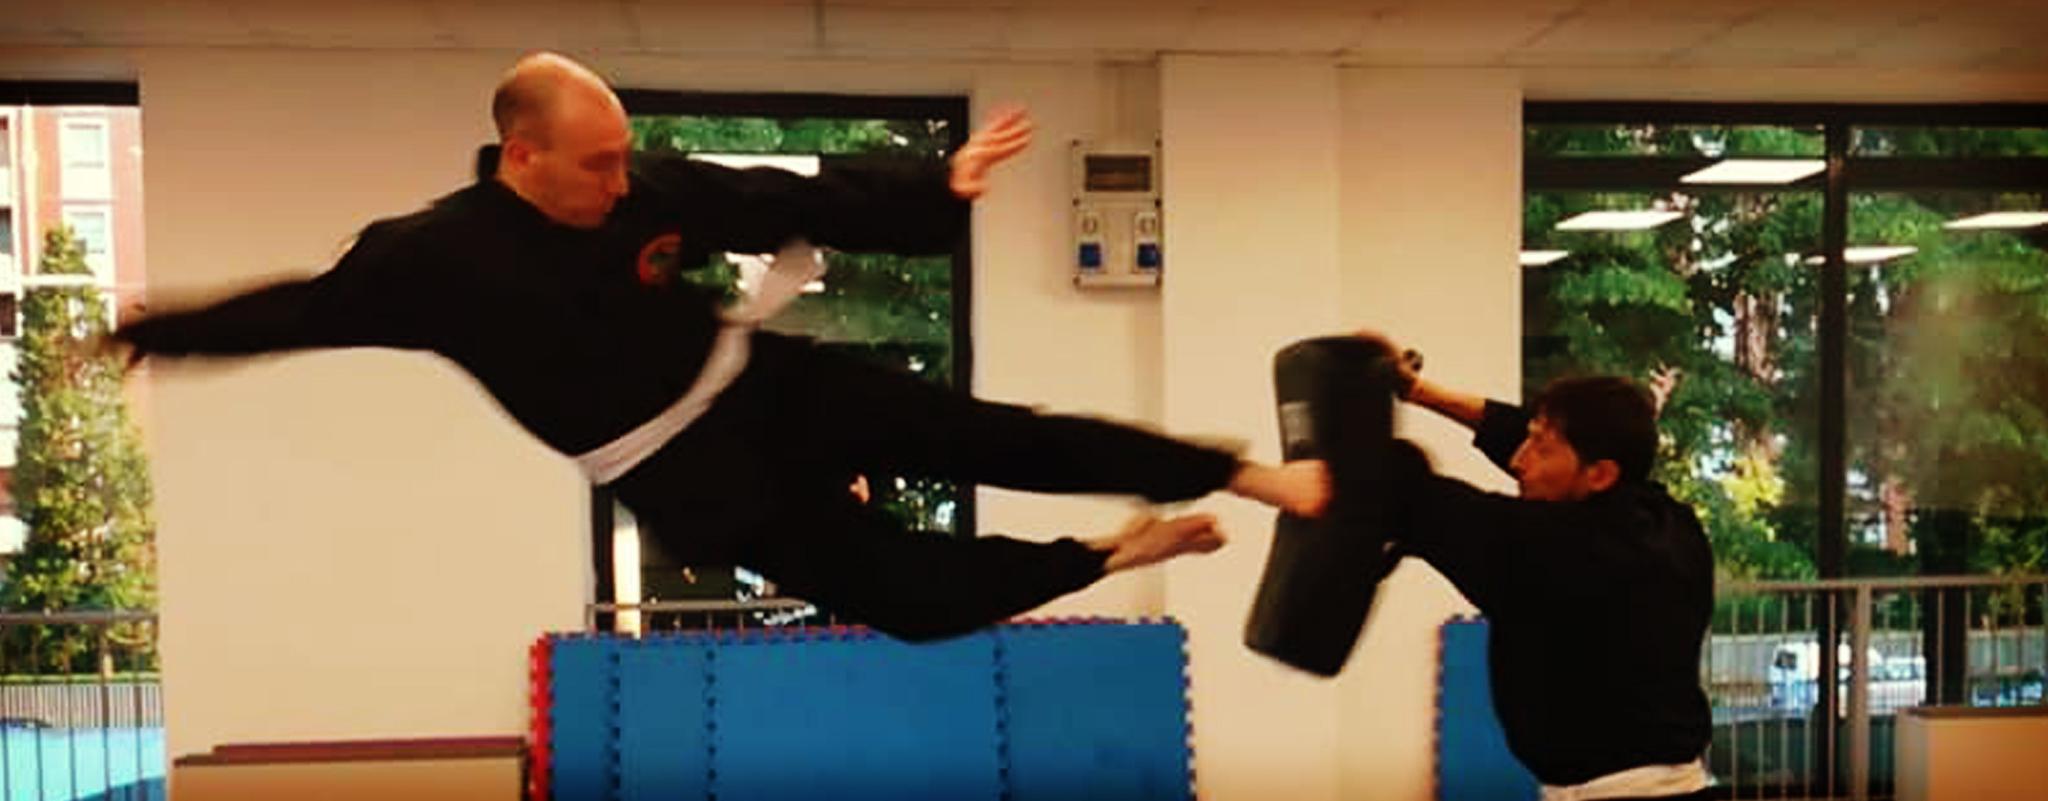 Scuola Kung fu Milano 1